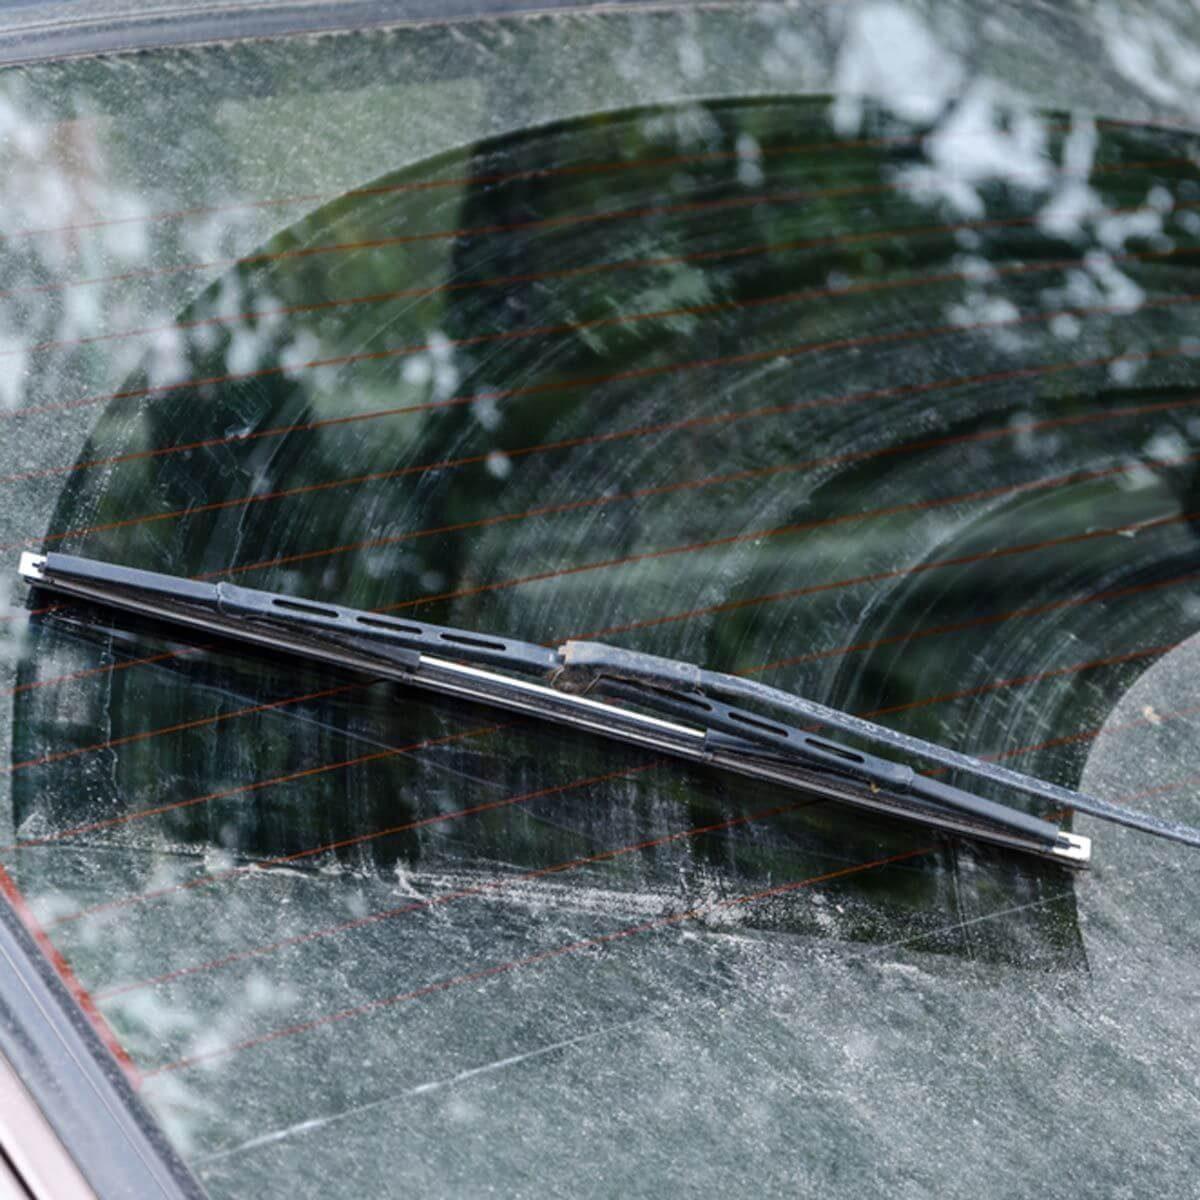 dirty windshield